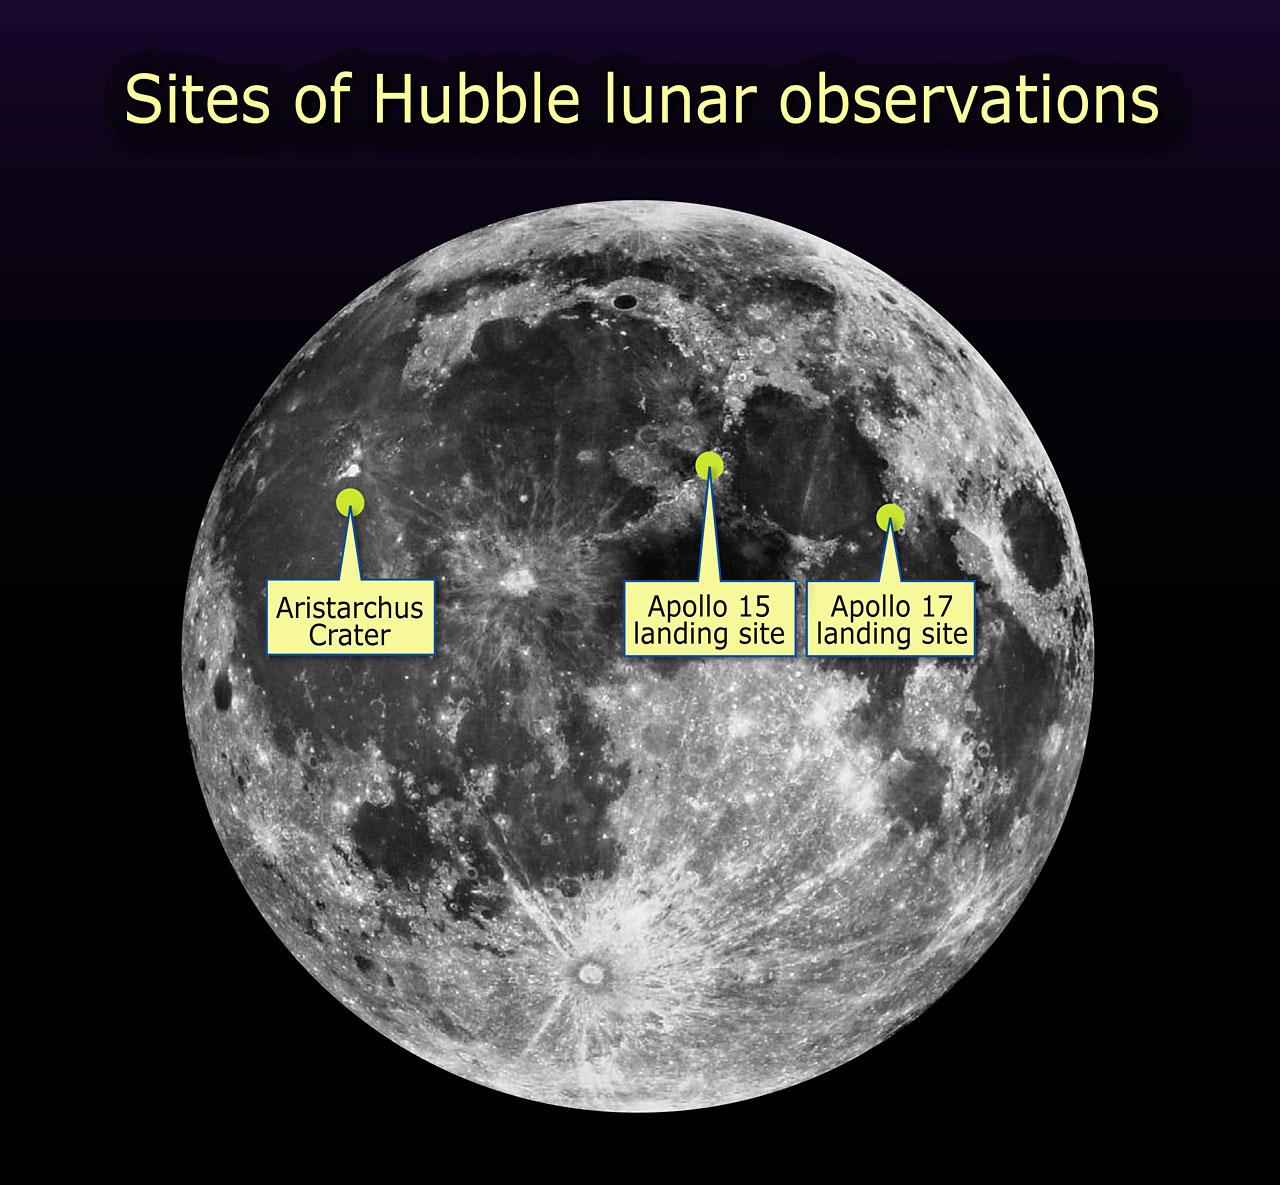 moon observation nasa - photo #9